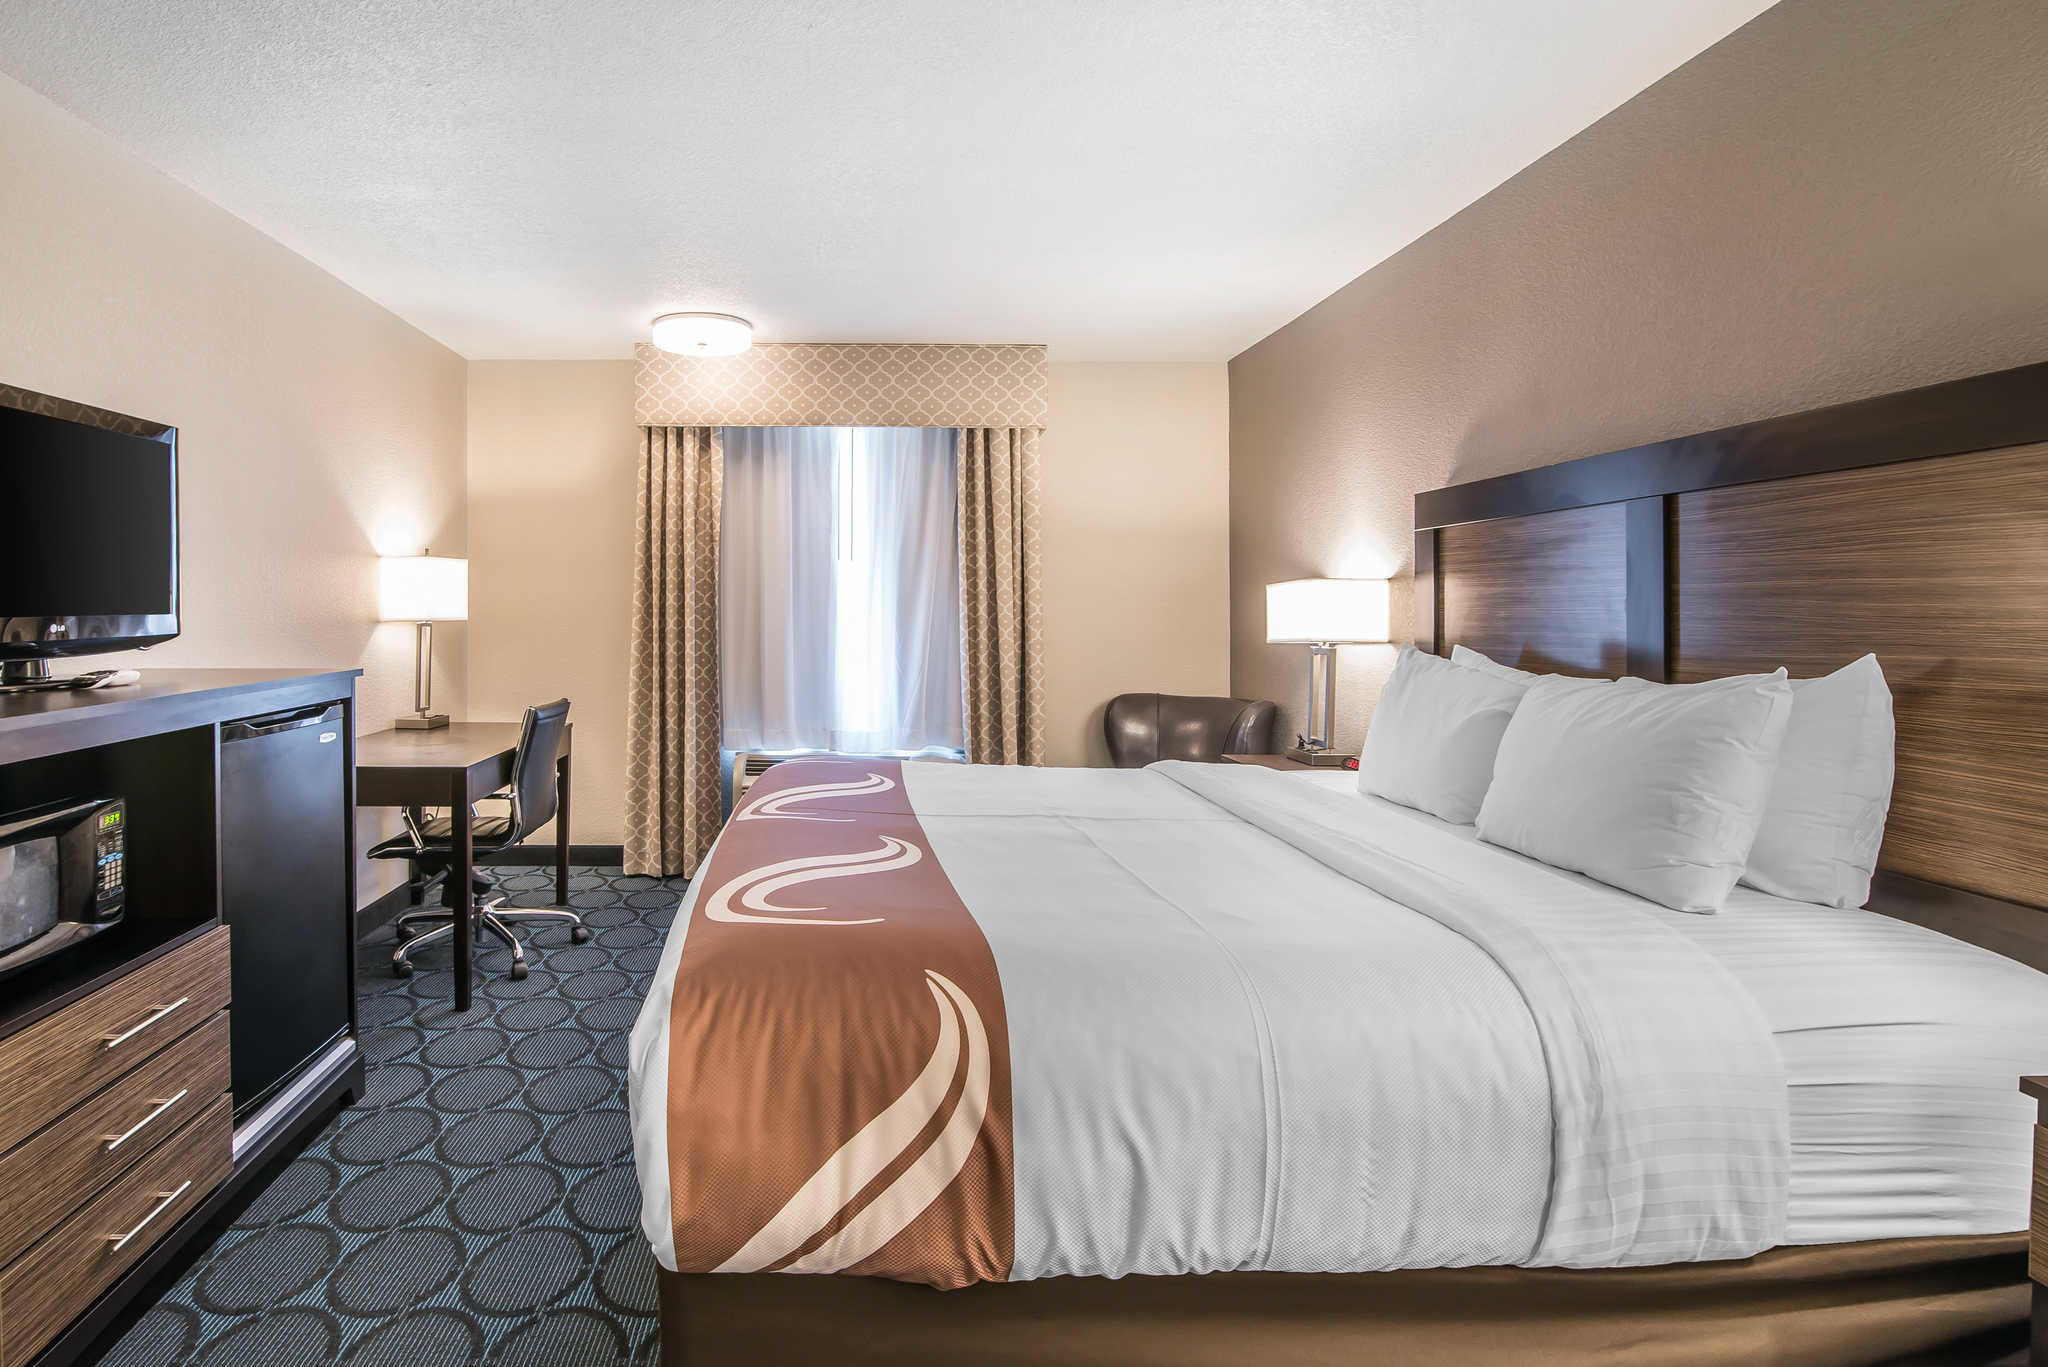 Quality Inn & Suites - Ruidoso Hwy 70 image 9